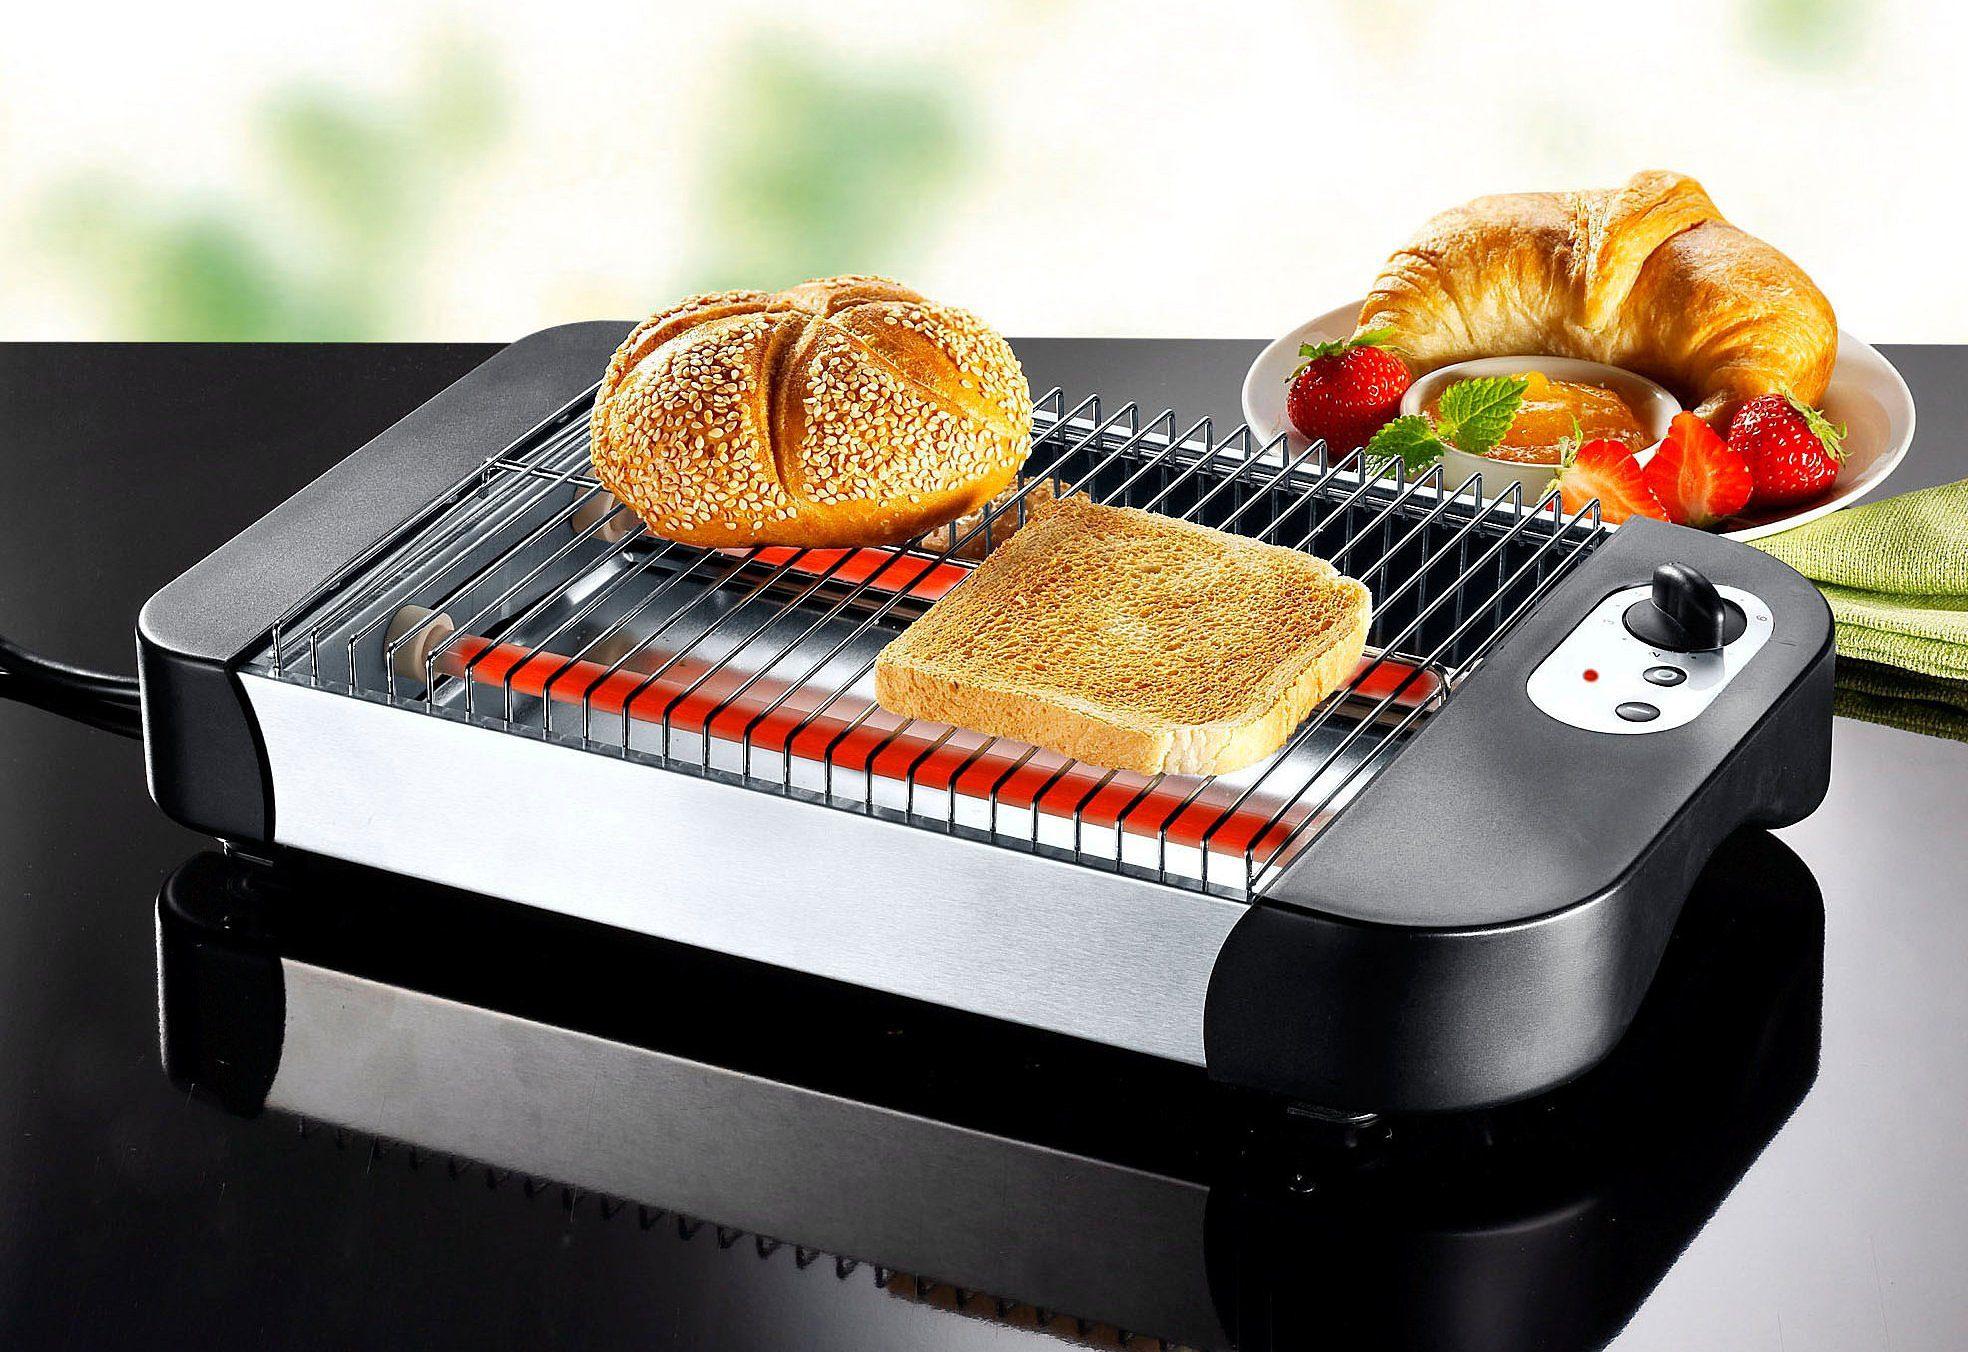 maxx cuisine Toaster maxxcuisine, 600 W